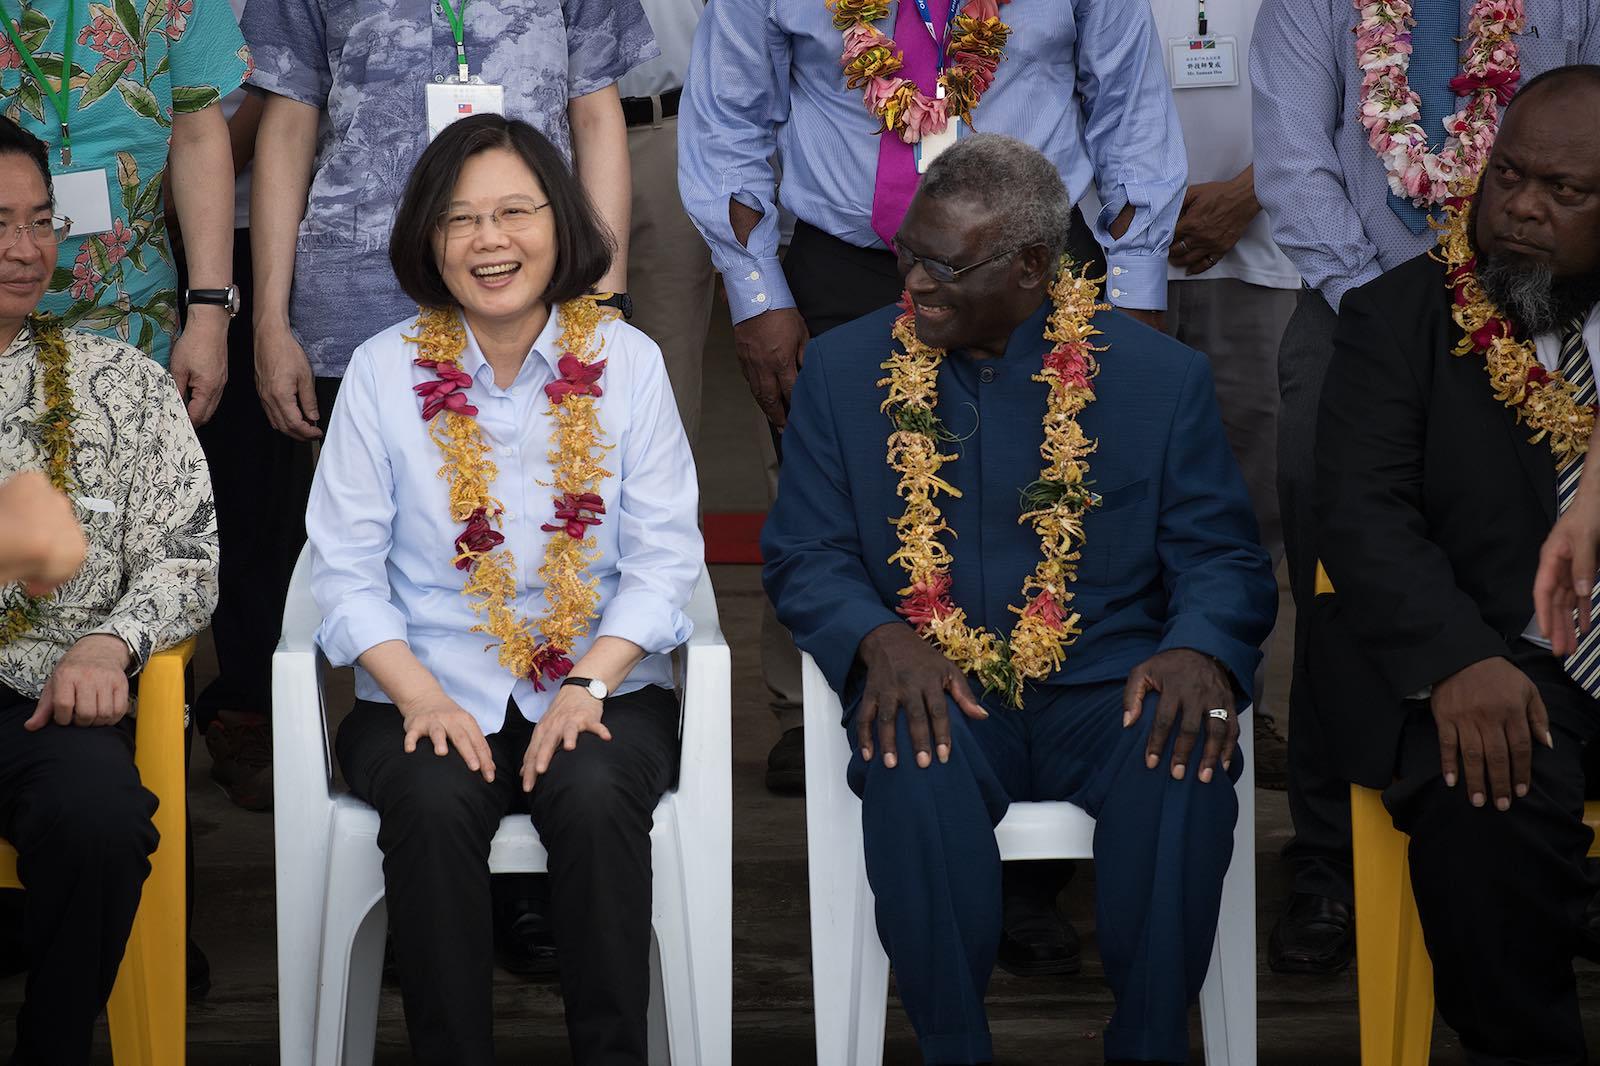 Taiwan's Tsai Ing-wen (left) with Solomon Islands' Manasseh Sogavare in Honiara, 2017 (Photo: Taiwan Presidential Office/Flickr)